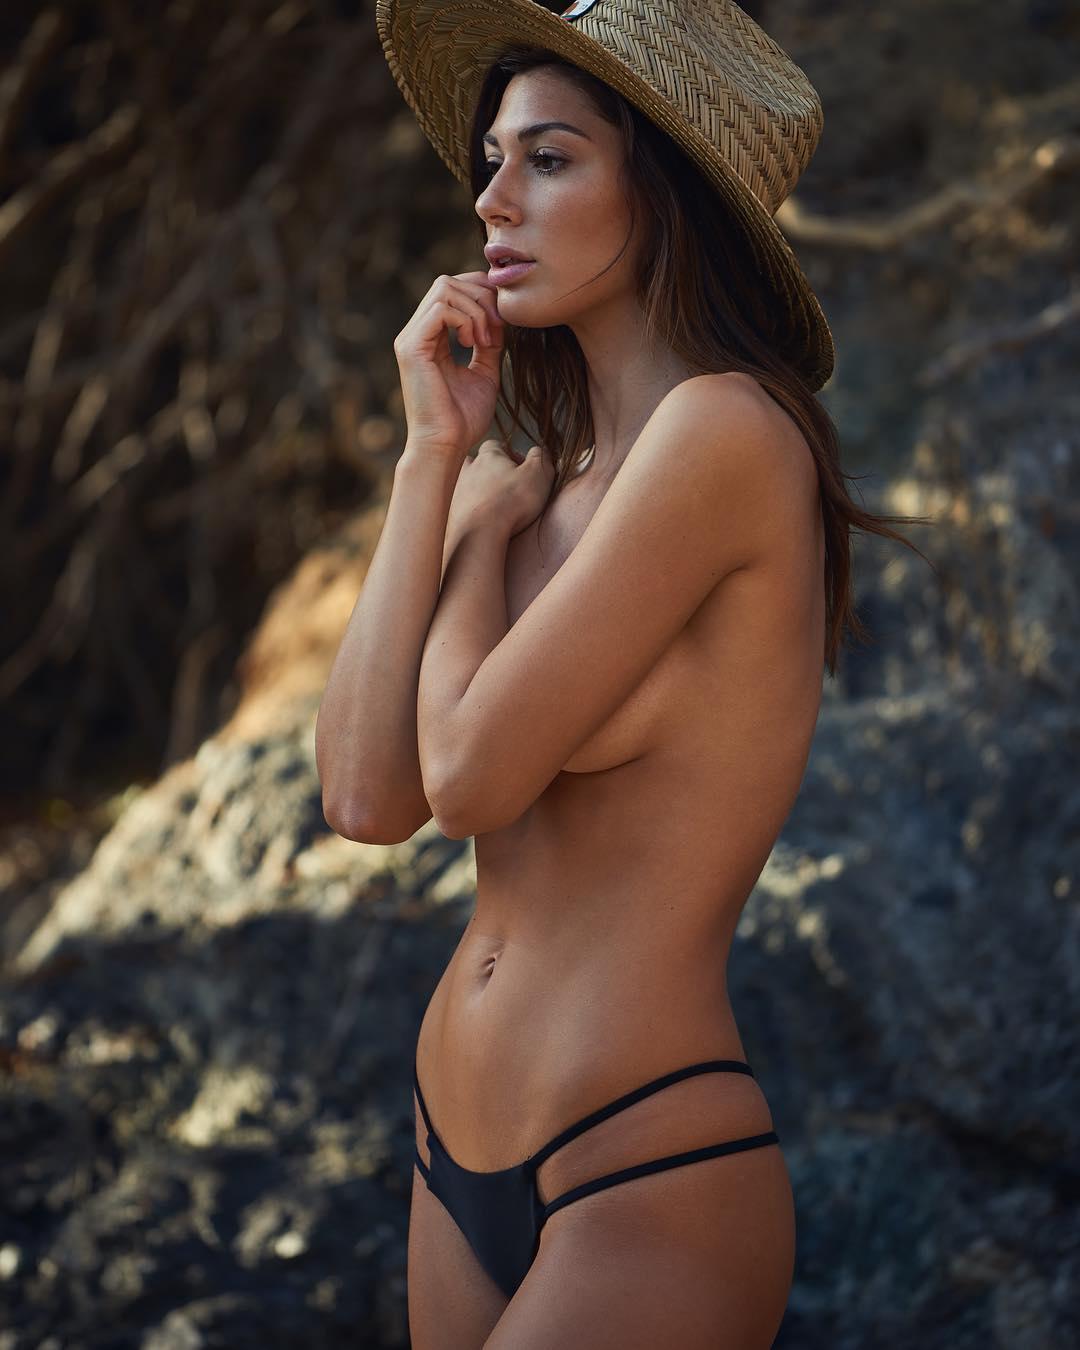 Claudia romani sexy 26 pics,GIFs Kristy Hinze Hot video Anna Herrin Naked. 2018-2019 celebrityes photos leaks!,VIDEO Kate Hudson